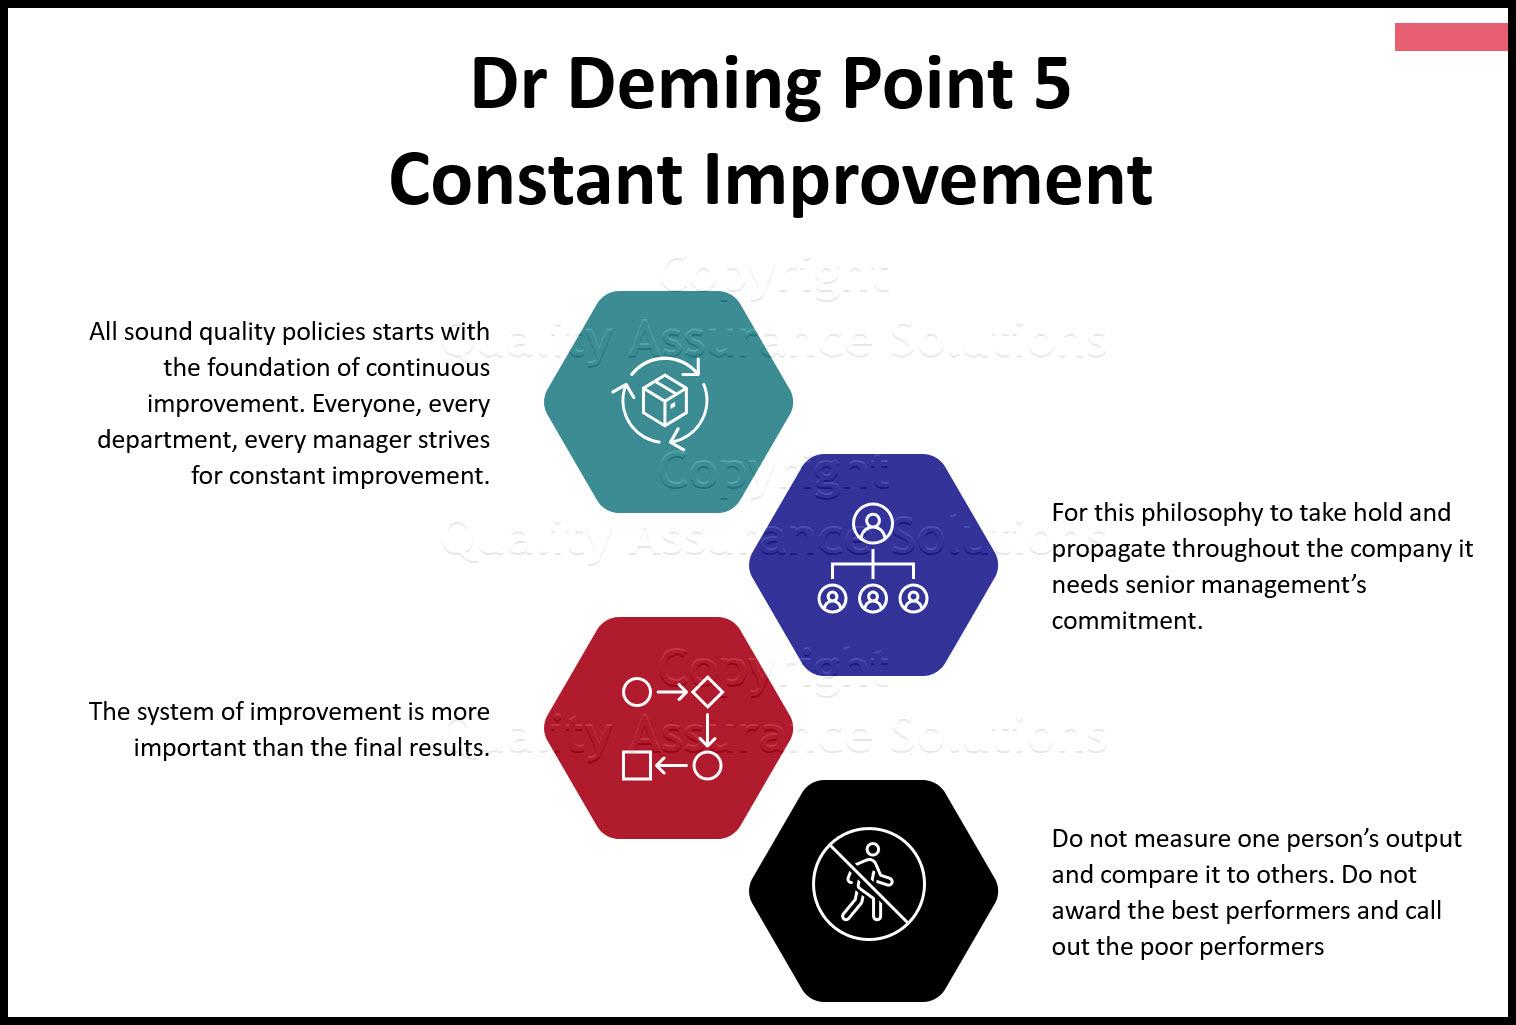 Deming Point 5 business slide